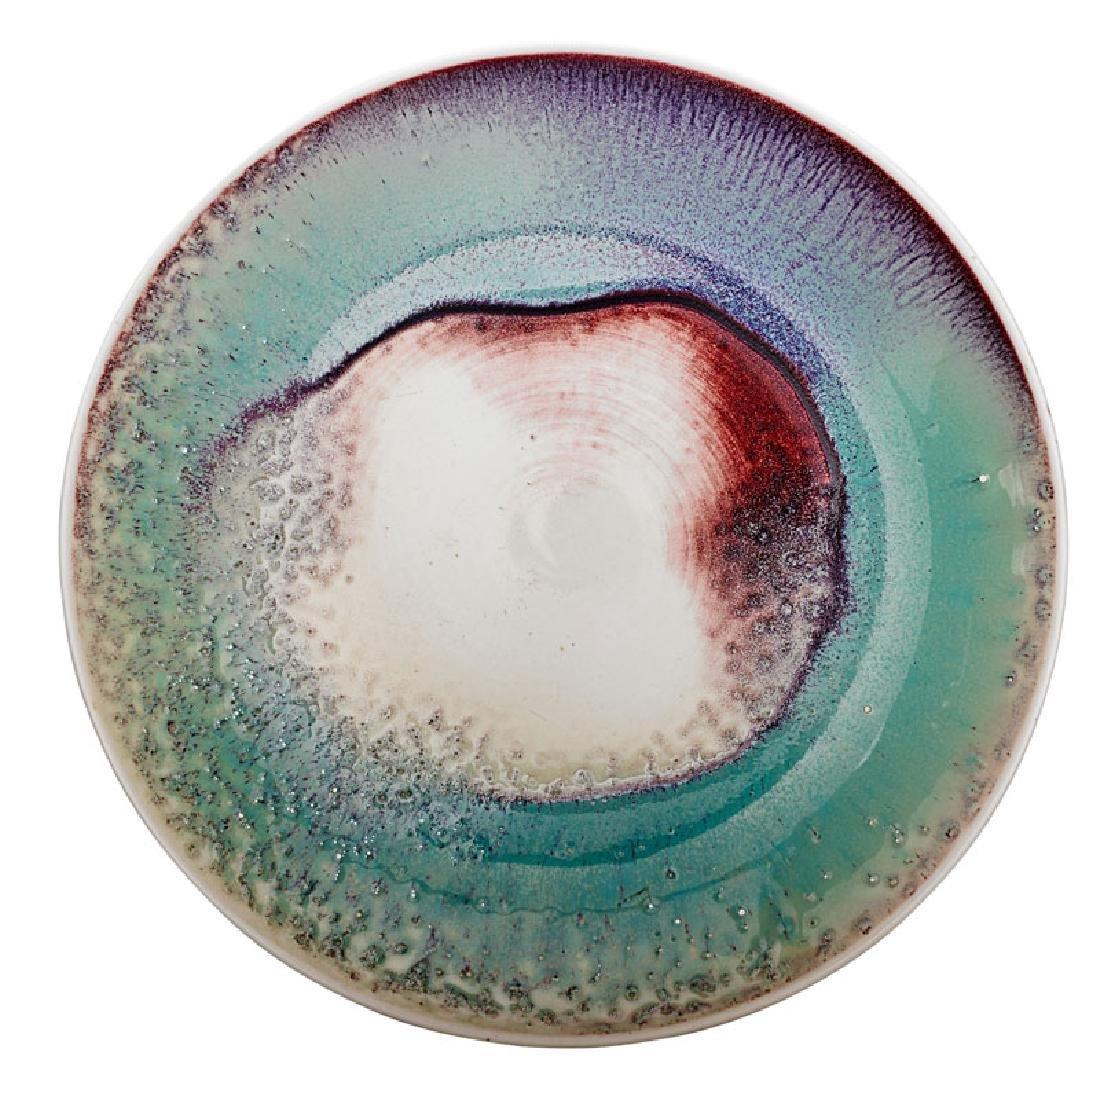 TOINI MUONA Glazed porcelain charger